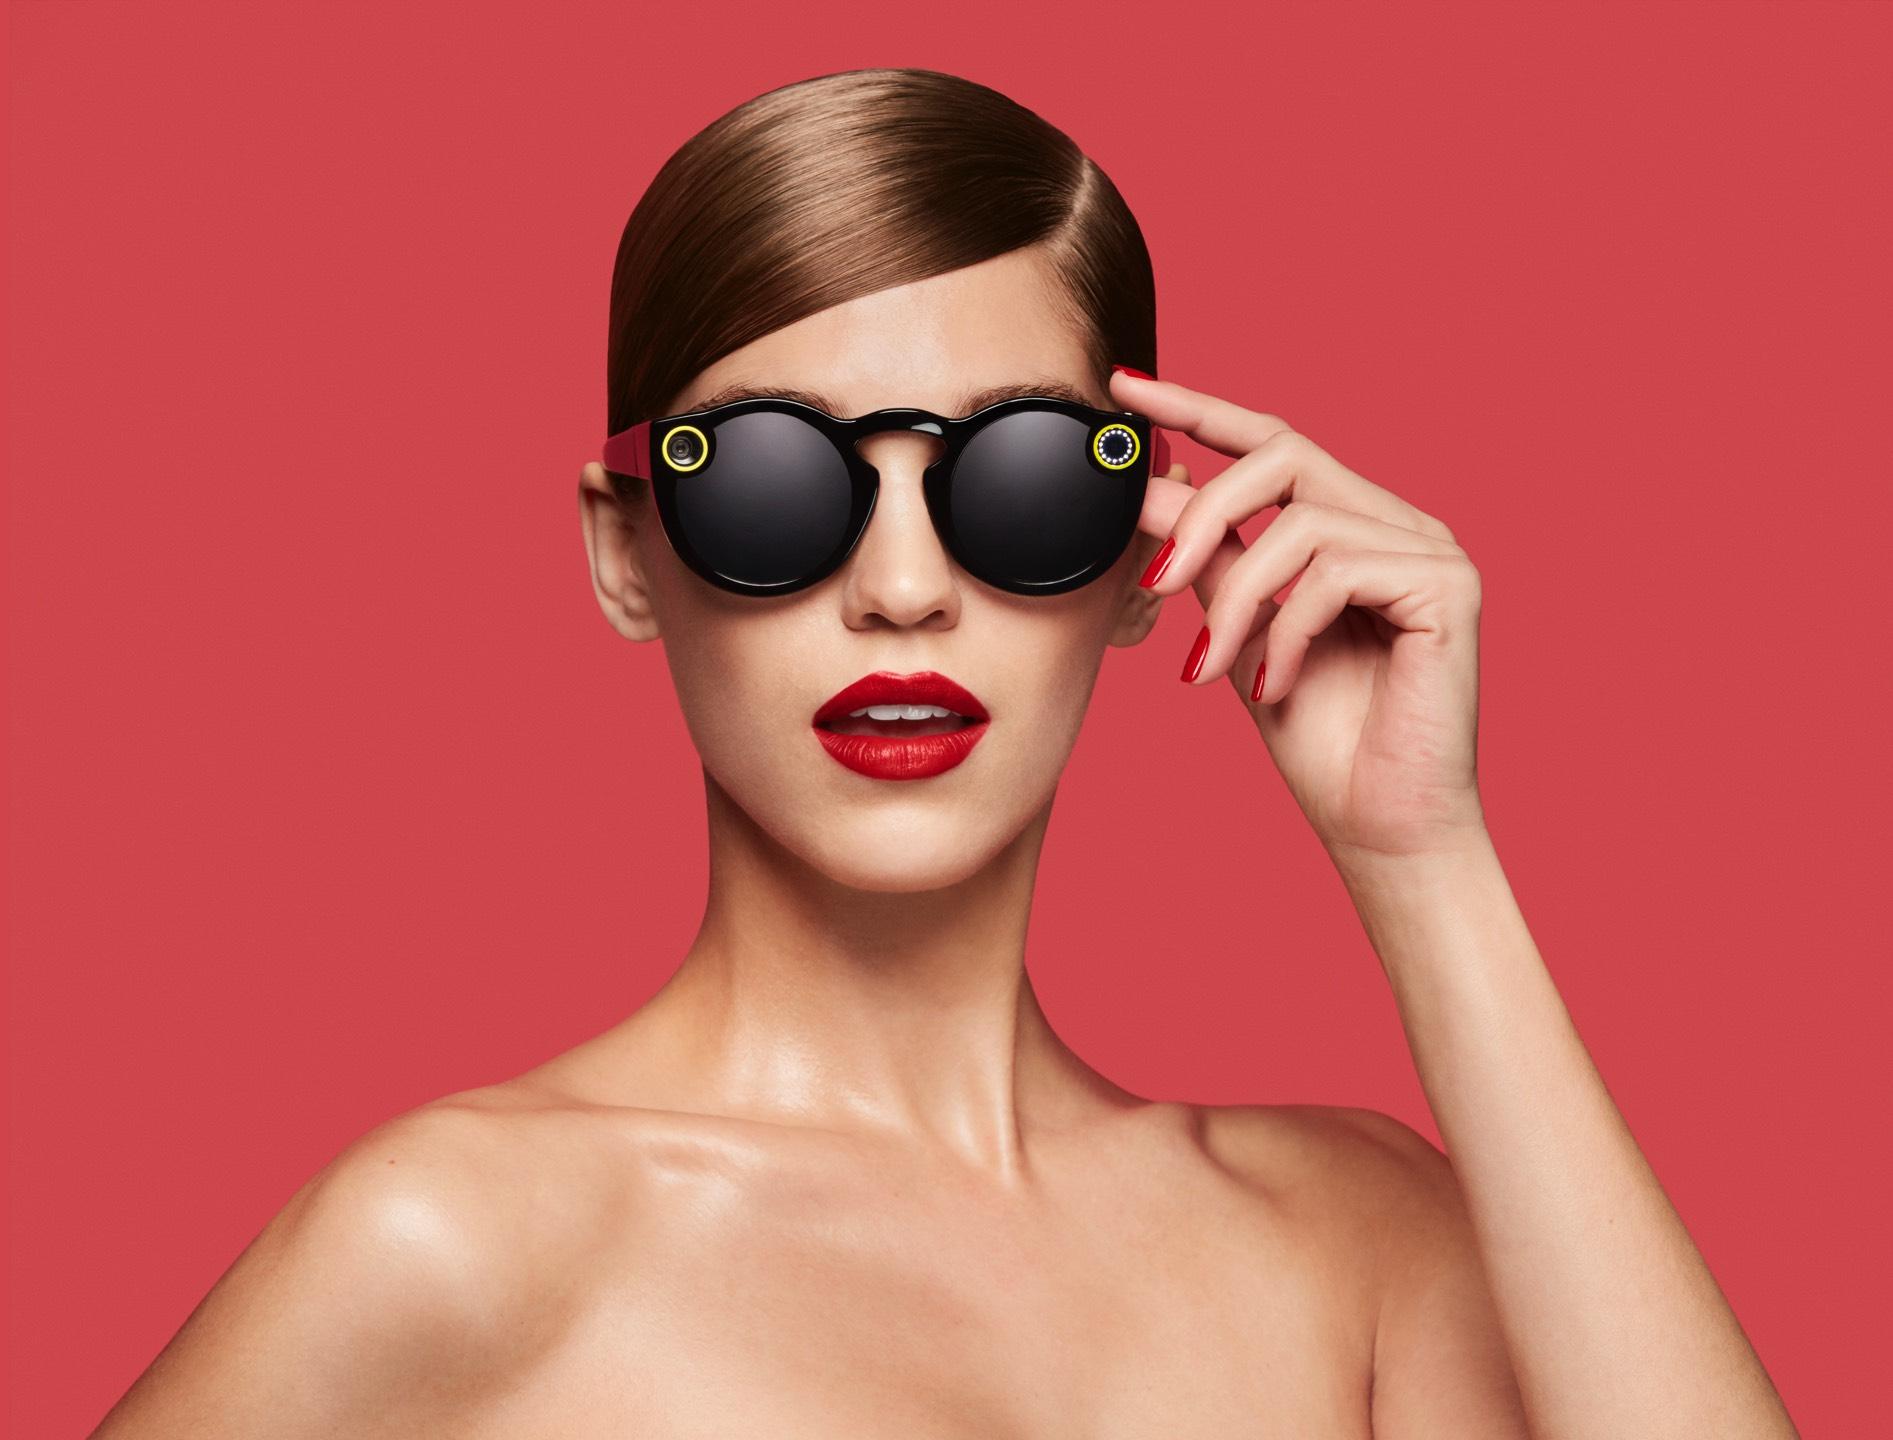 snap spectacles inteligentne okulary snapchat